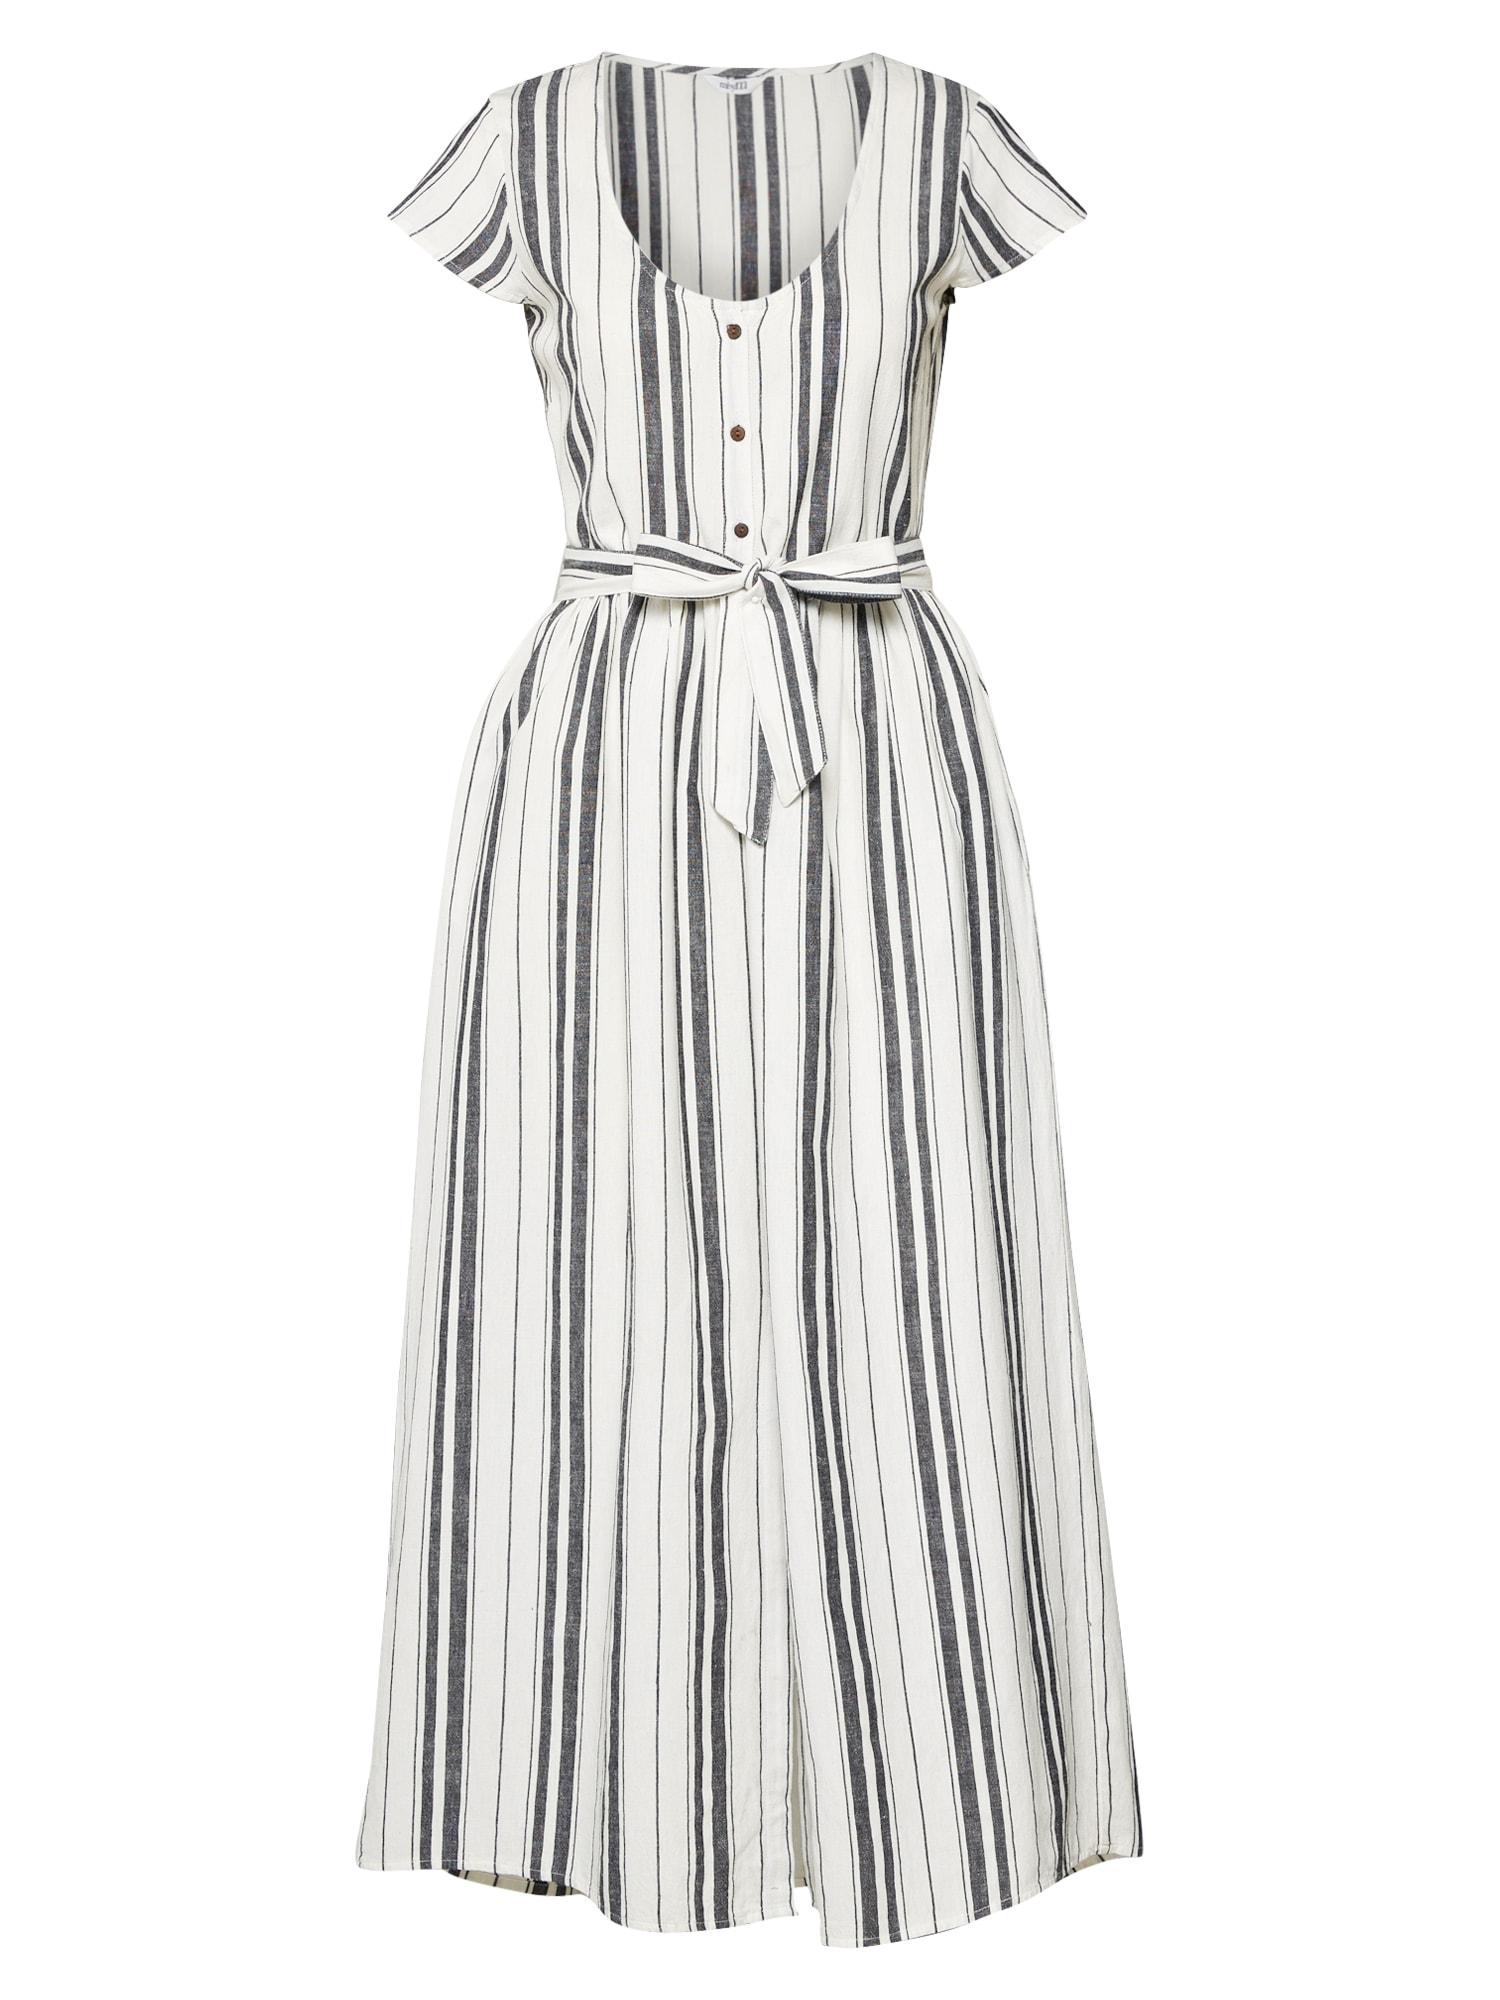 Šaty Blakely bílá Mbym